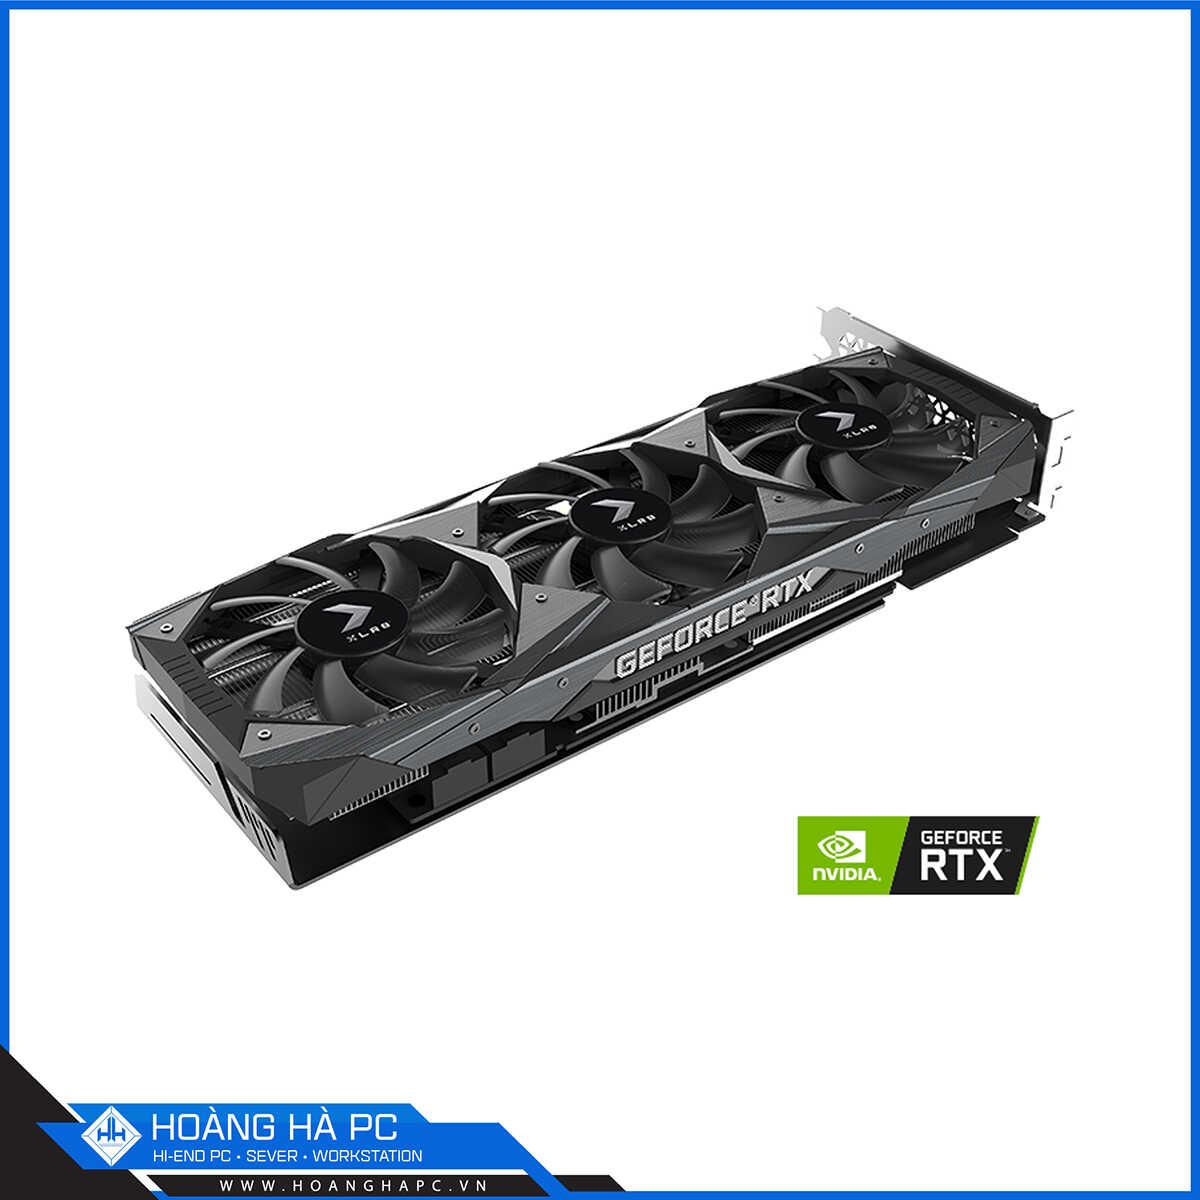 VGA PNY GeForce RTX 2080 Ti 11GB XLR8